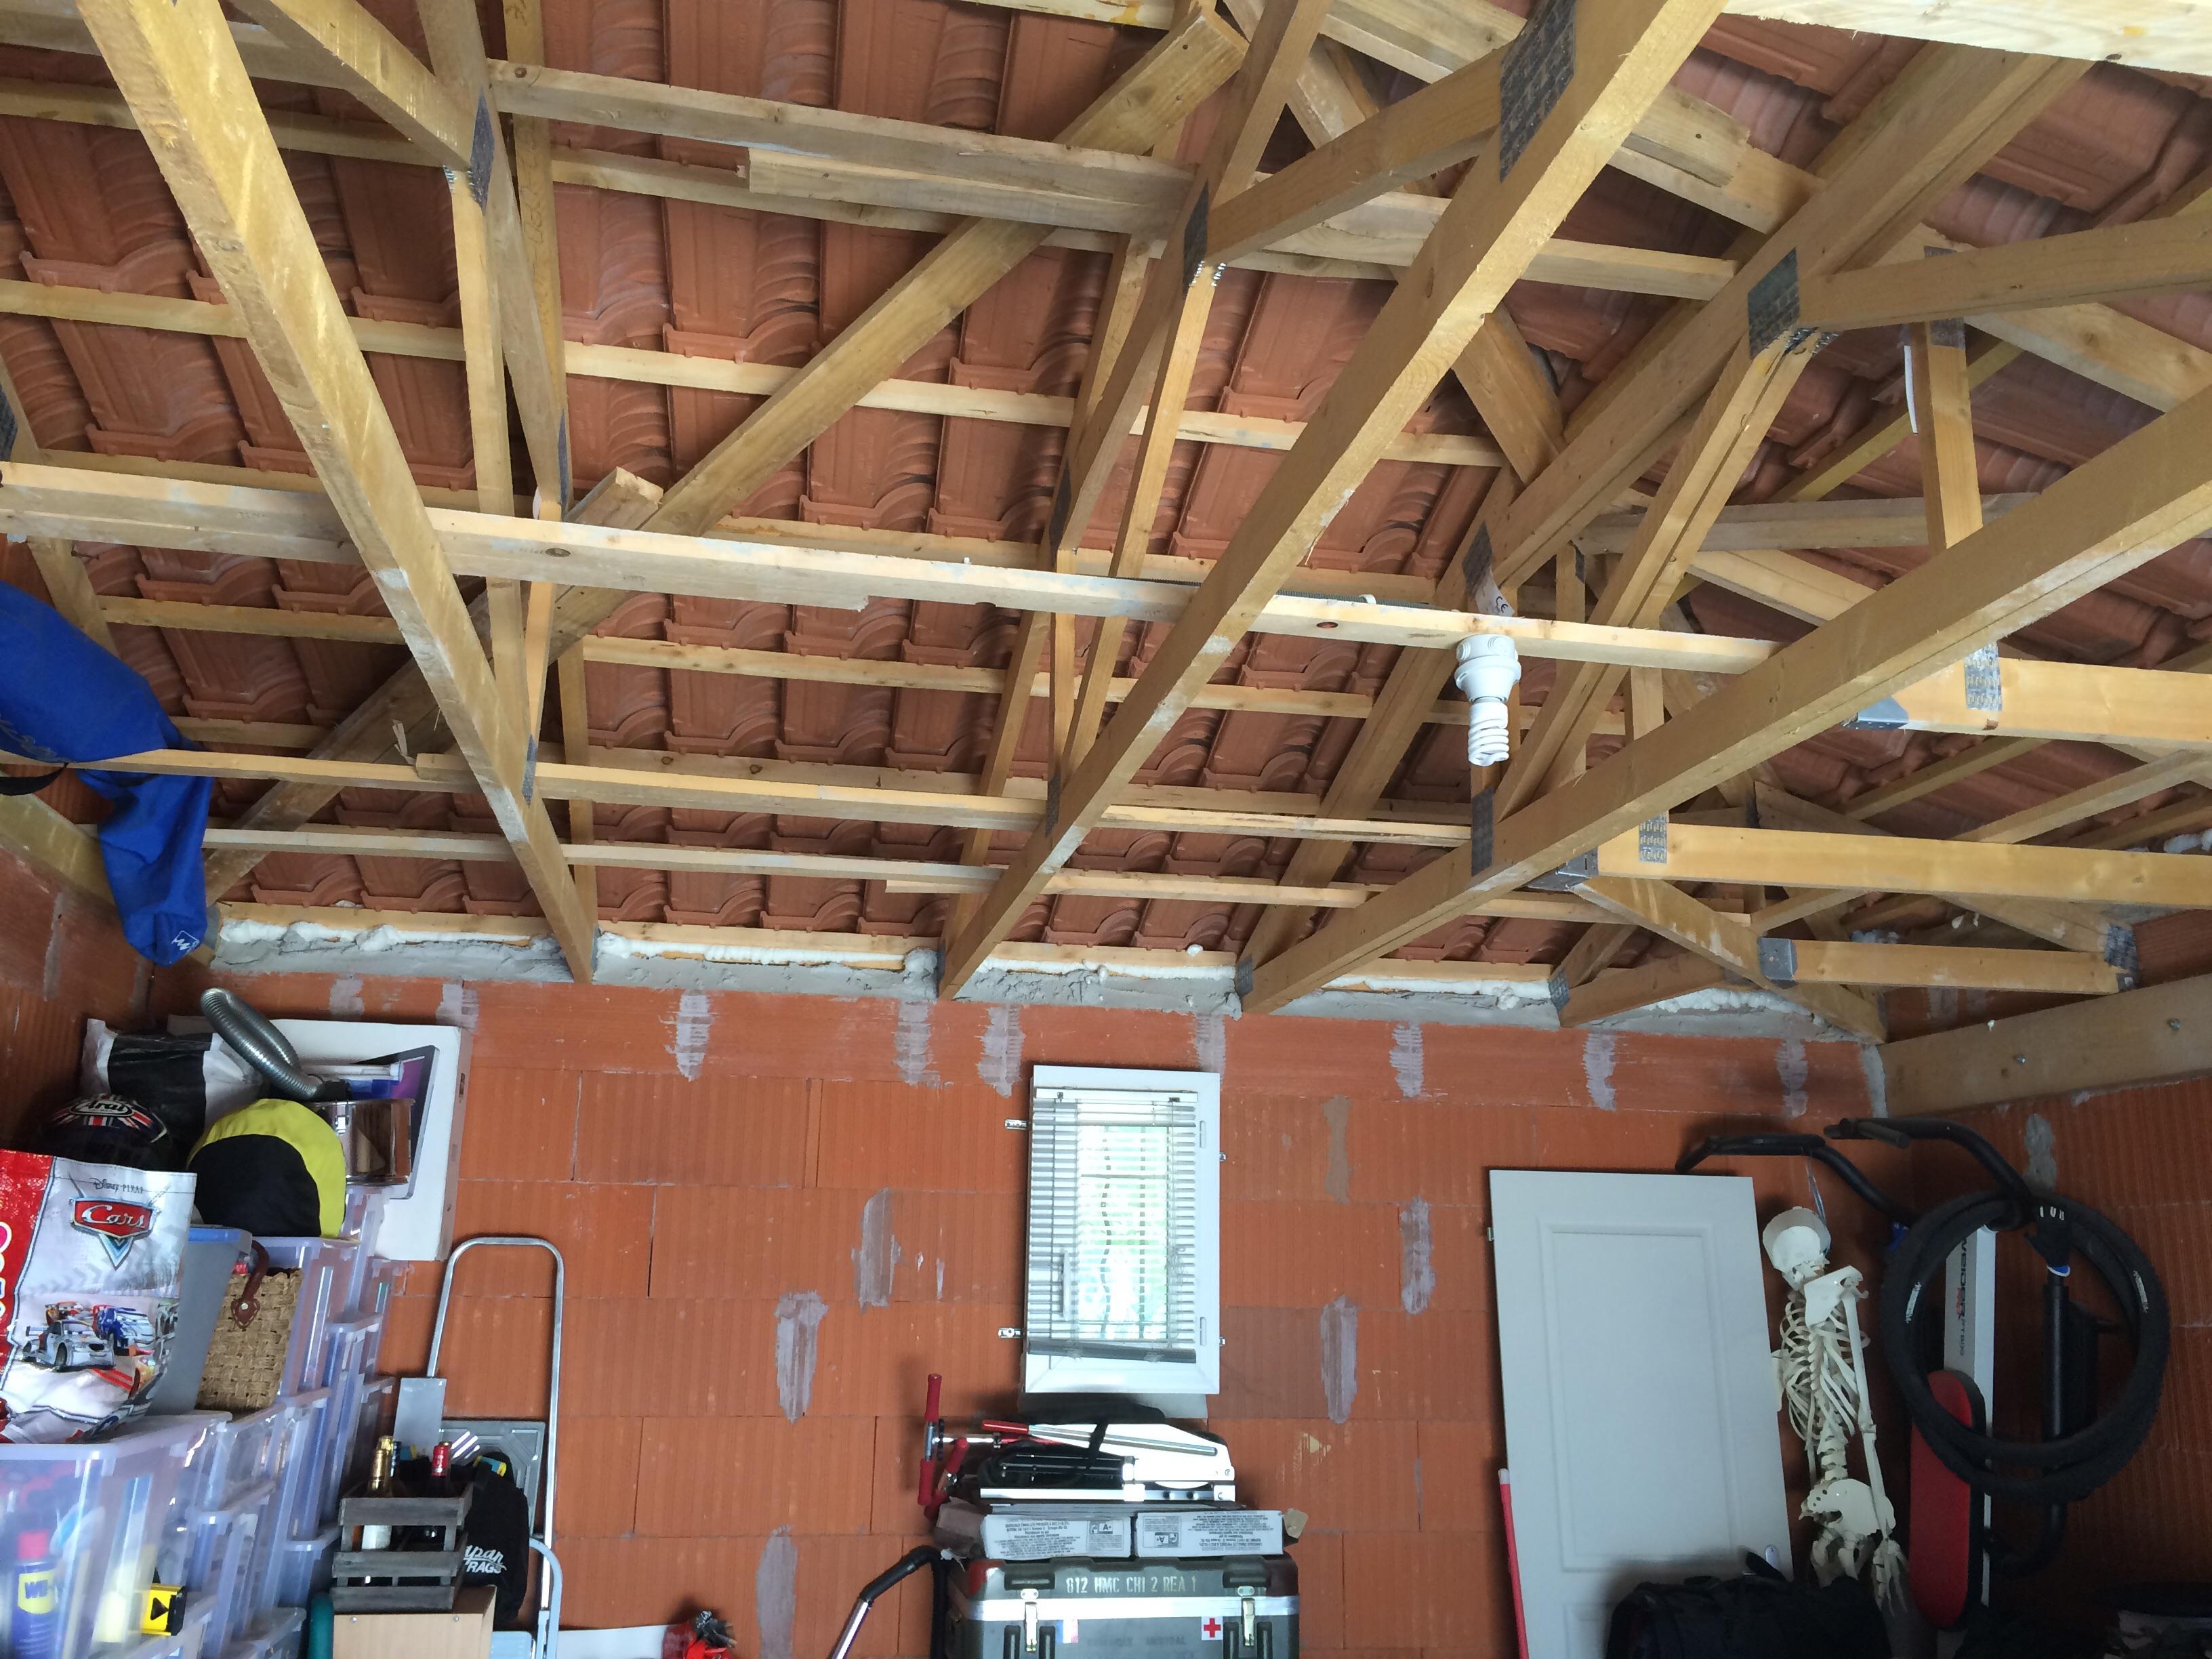 re plafond suspendu sur charpente 3 pentes communaut leroy merlin. Black Bedroom Furniture Sets. Home Design Ideas